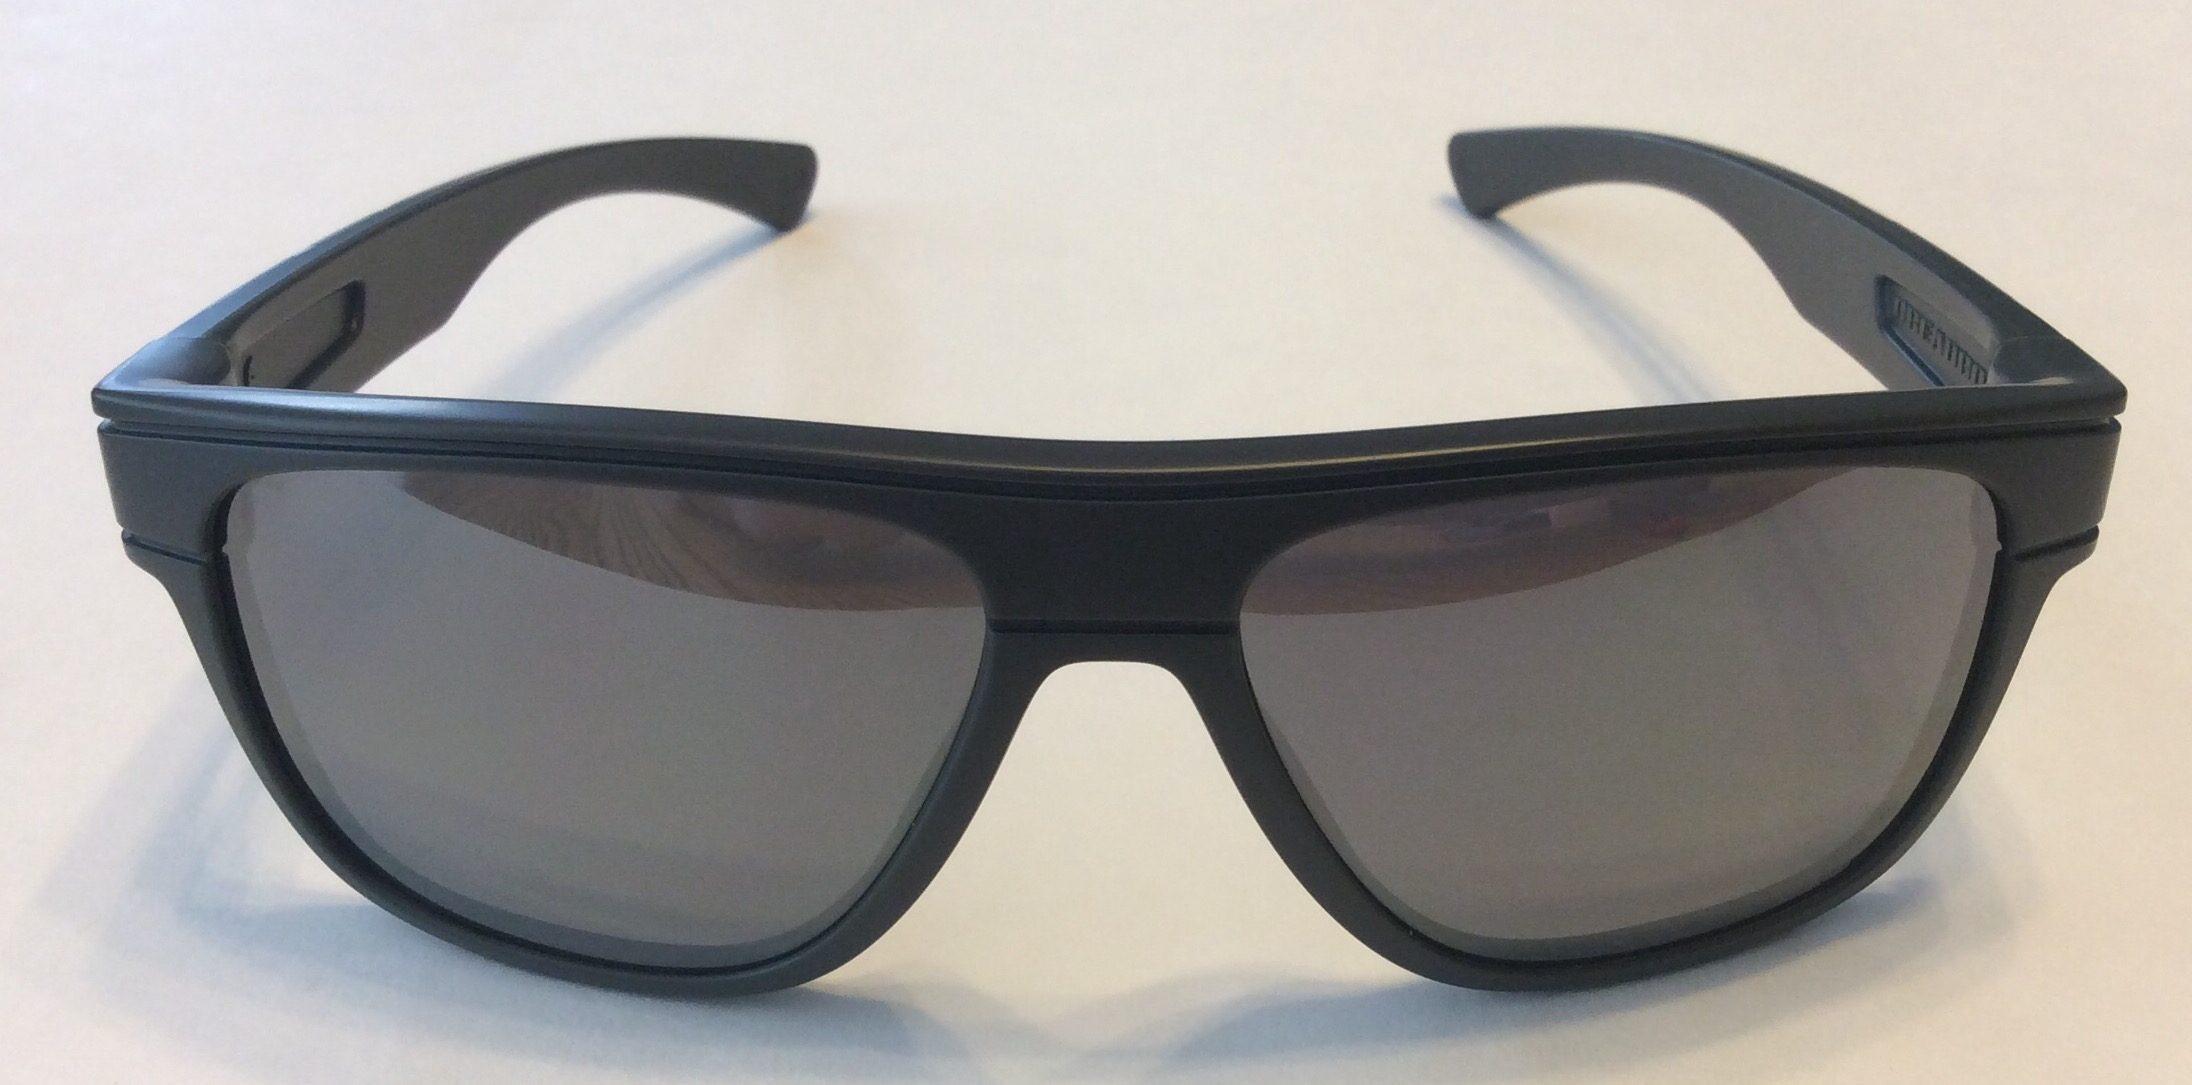 cfbb31a3c8 Oakley Canteen Dark Amber. oakley canteen polarized sunglasses